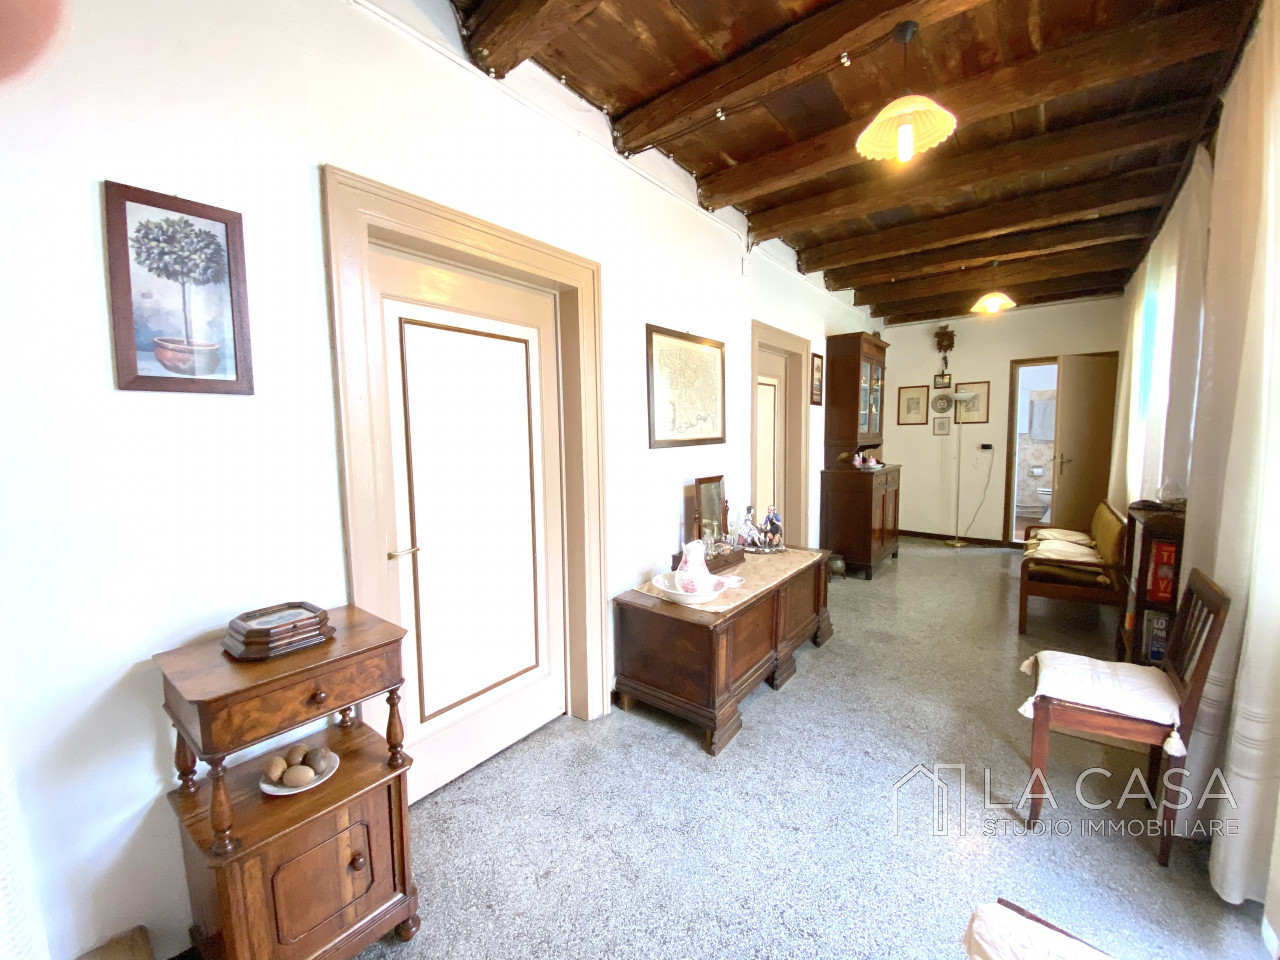 Palazzo plurifamiliare in vendita a Valvasone Arzene - Rif. P3 https://images.gestionaleimmobiliare.it/foto/annunci/200827/2284141/1280x1280/007__img_3708_wmk_0.jpg